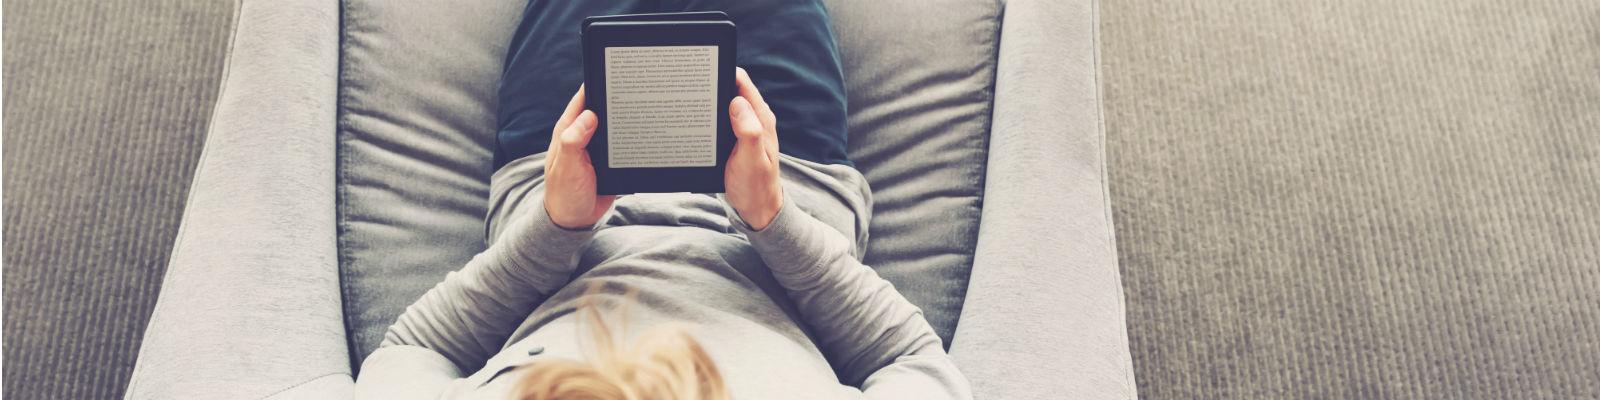 czytniki e-bookow